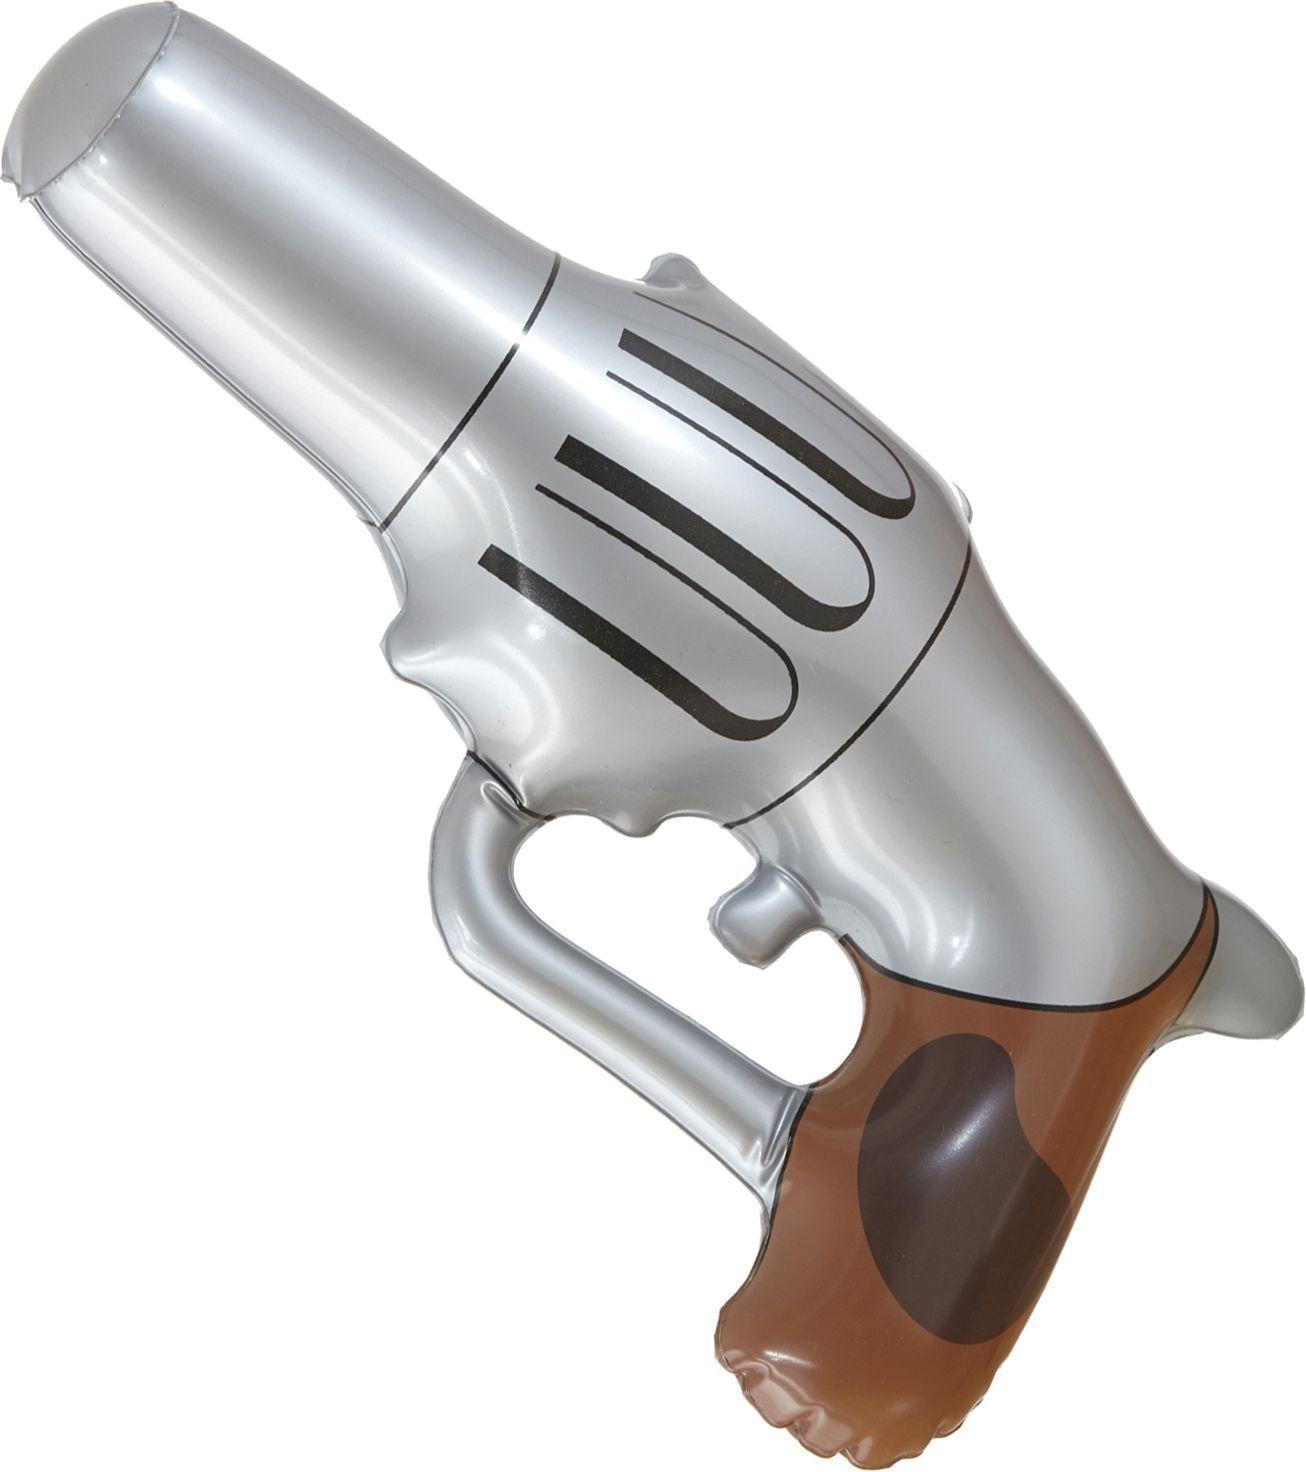 Cowboy pistool opblaasbaar